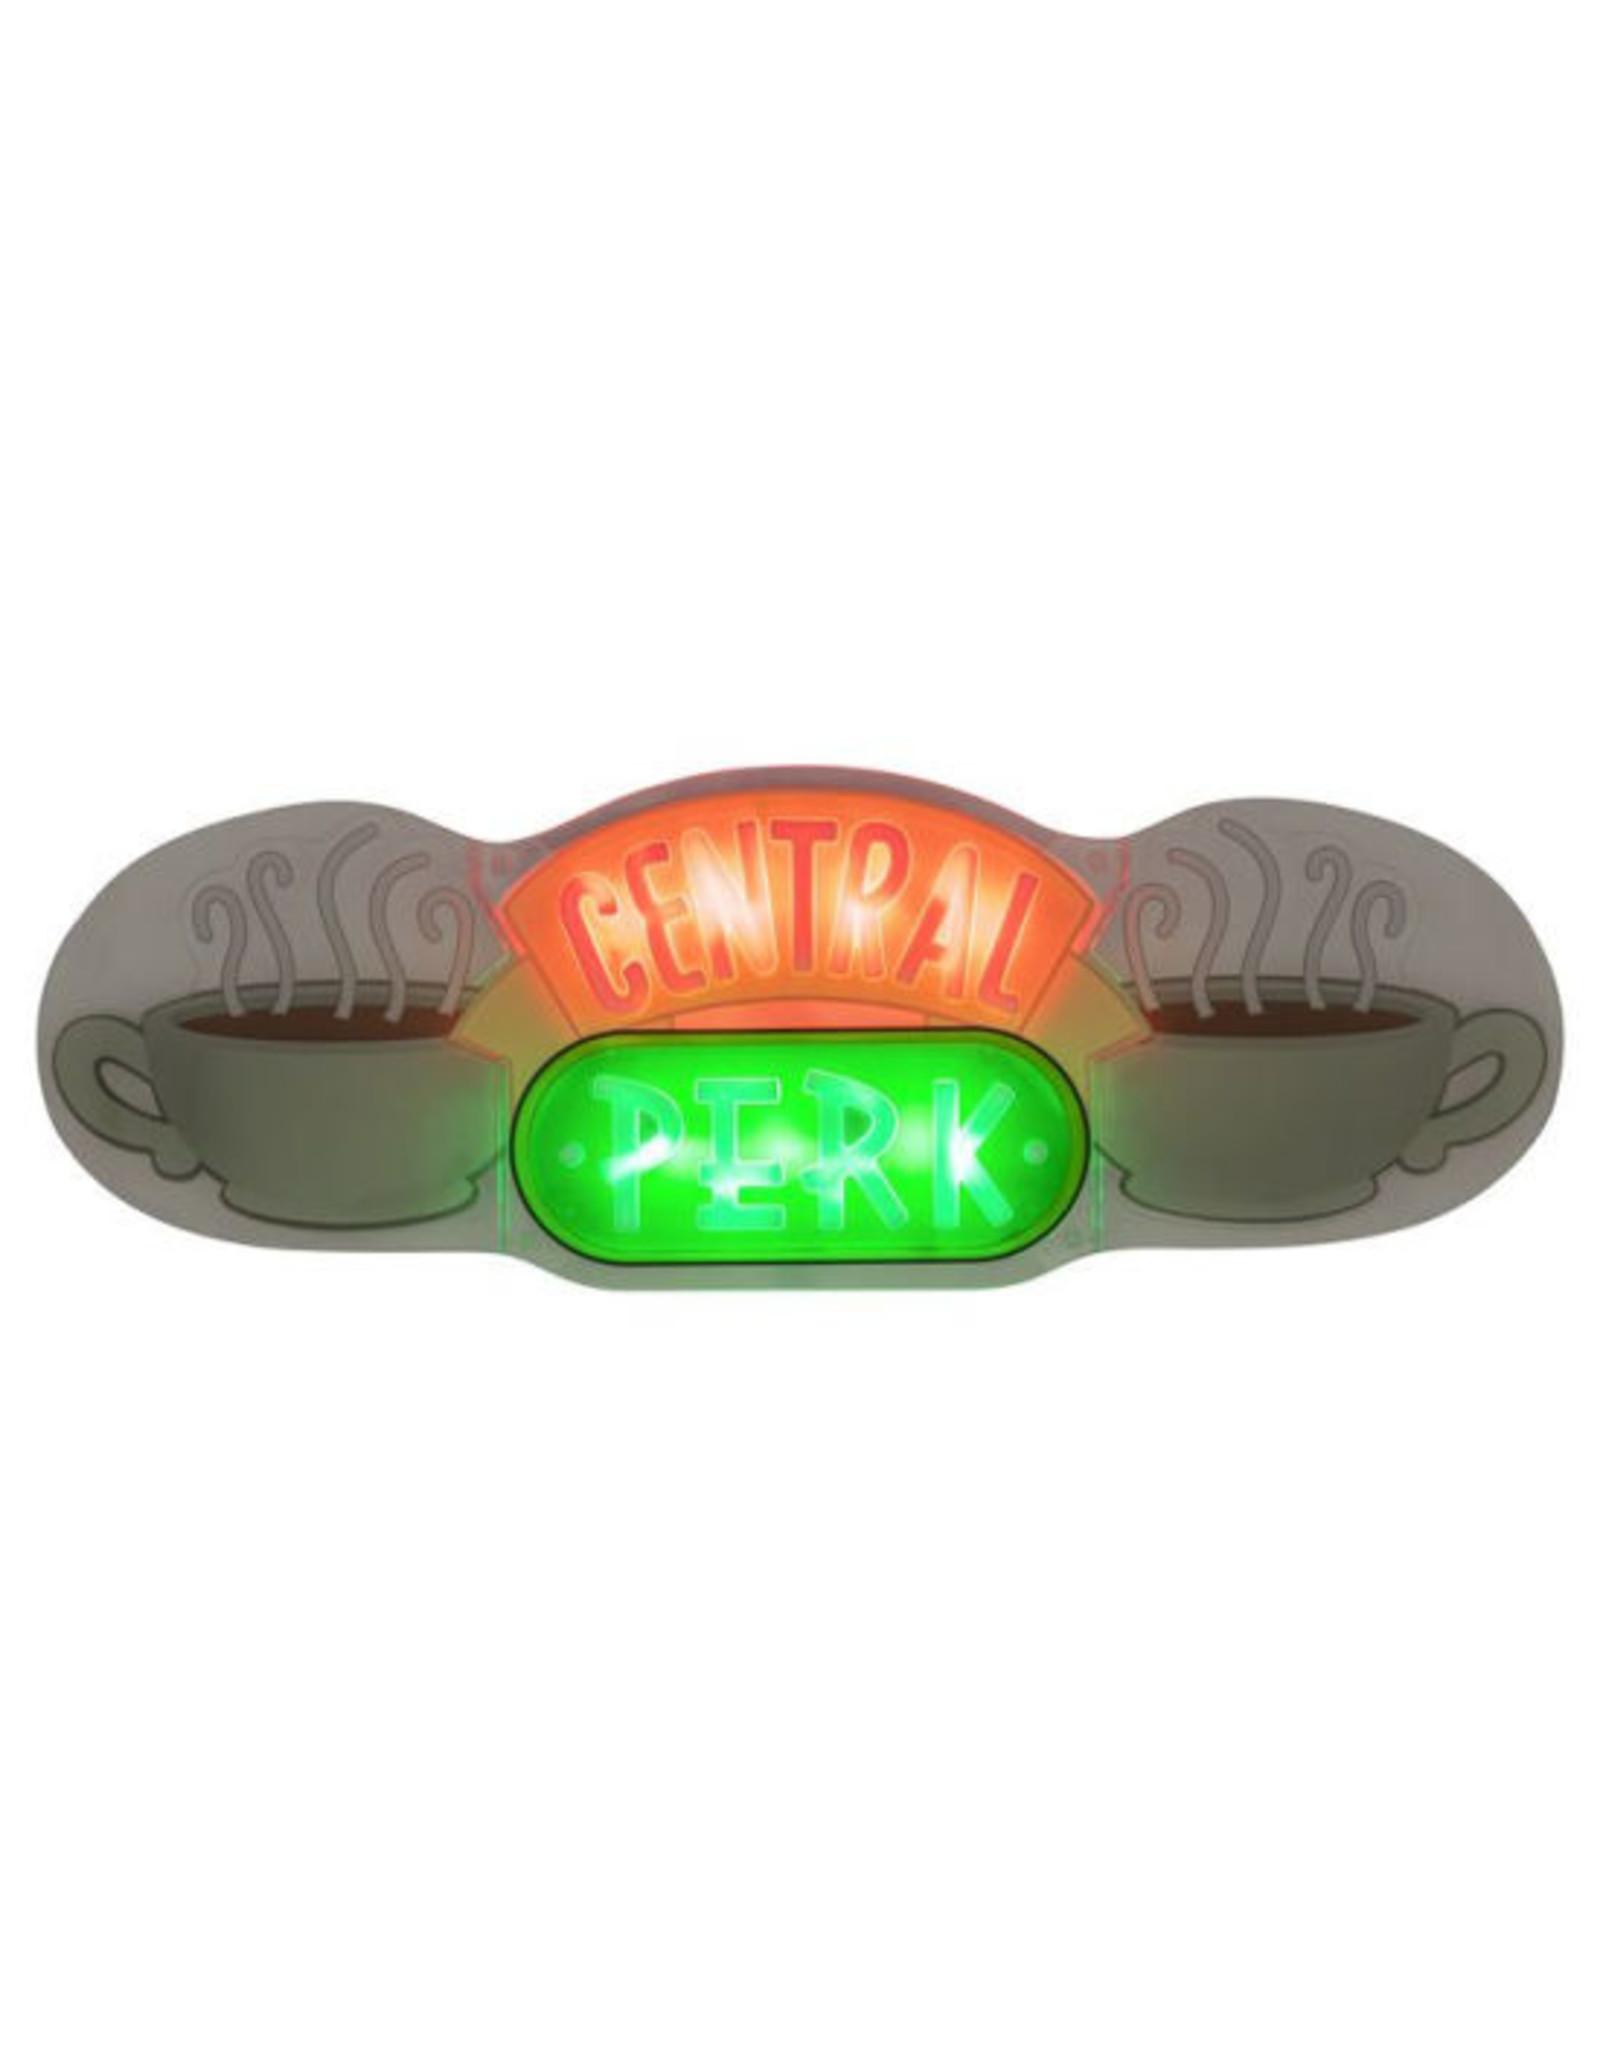 Paladone Central Perk Neon Light